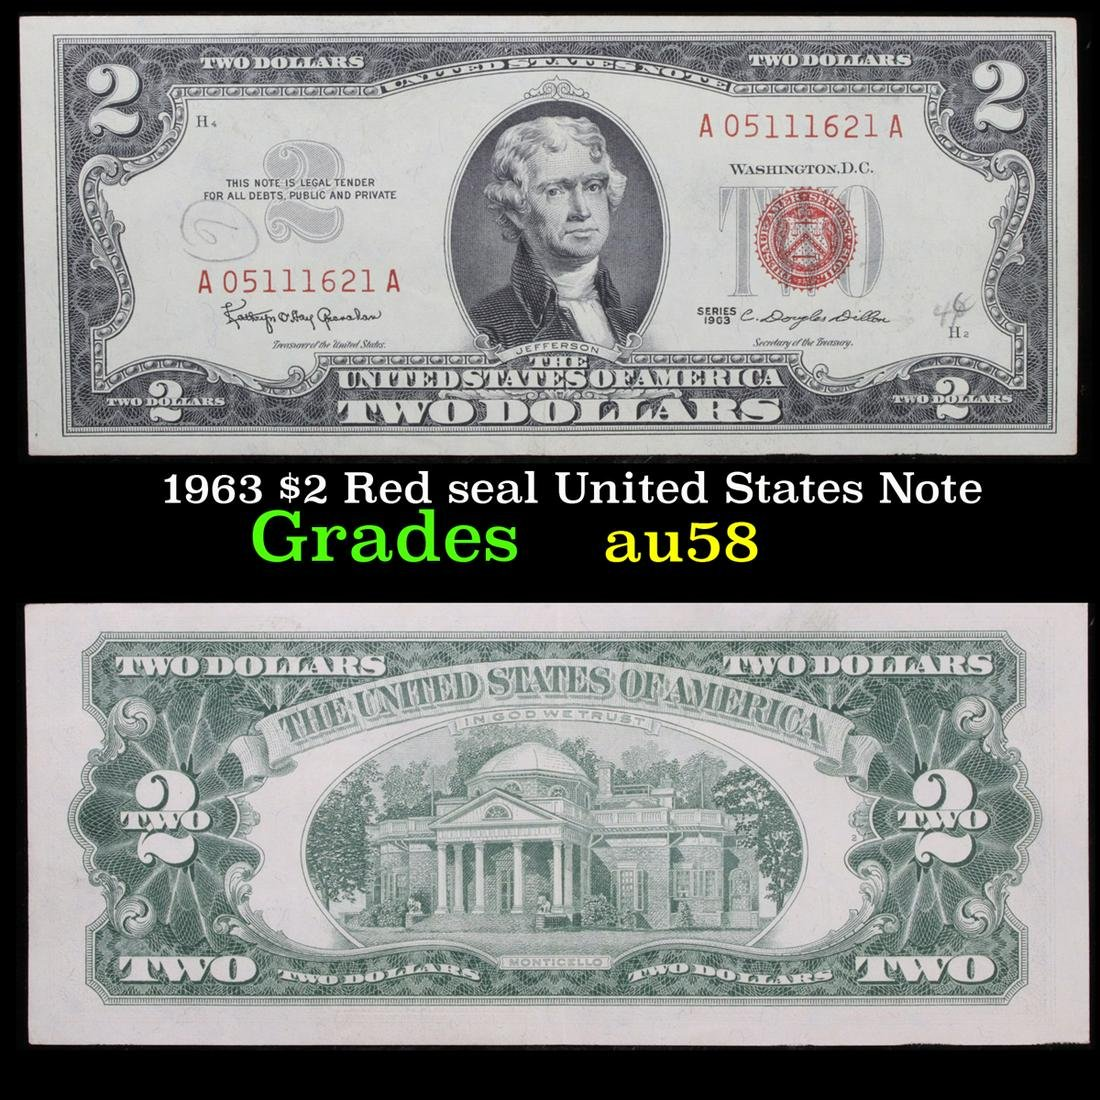 1963 $2 Red seal United States Note Grades Choice AU/BU